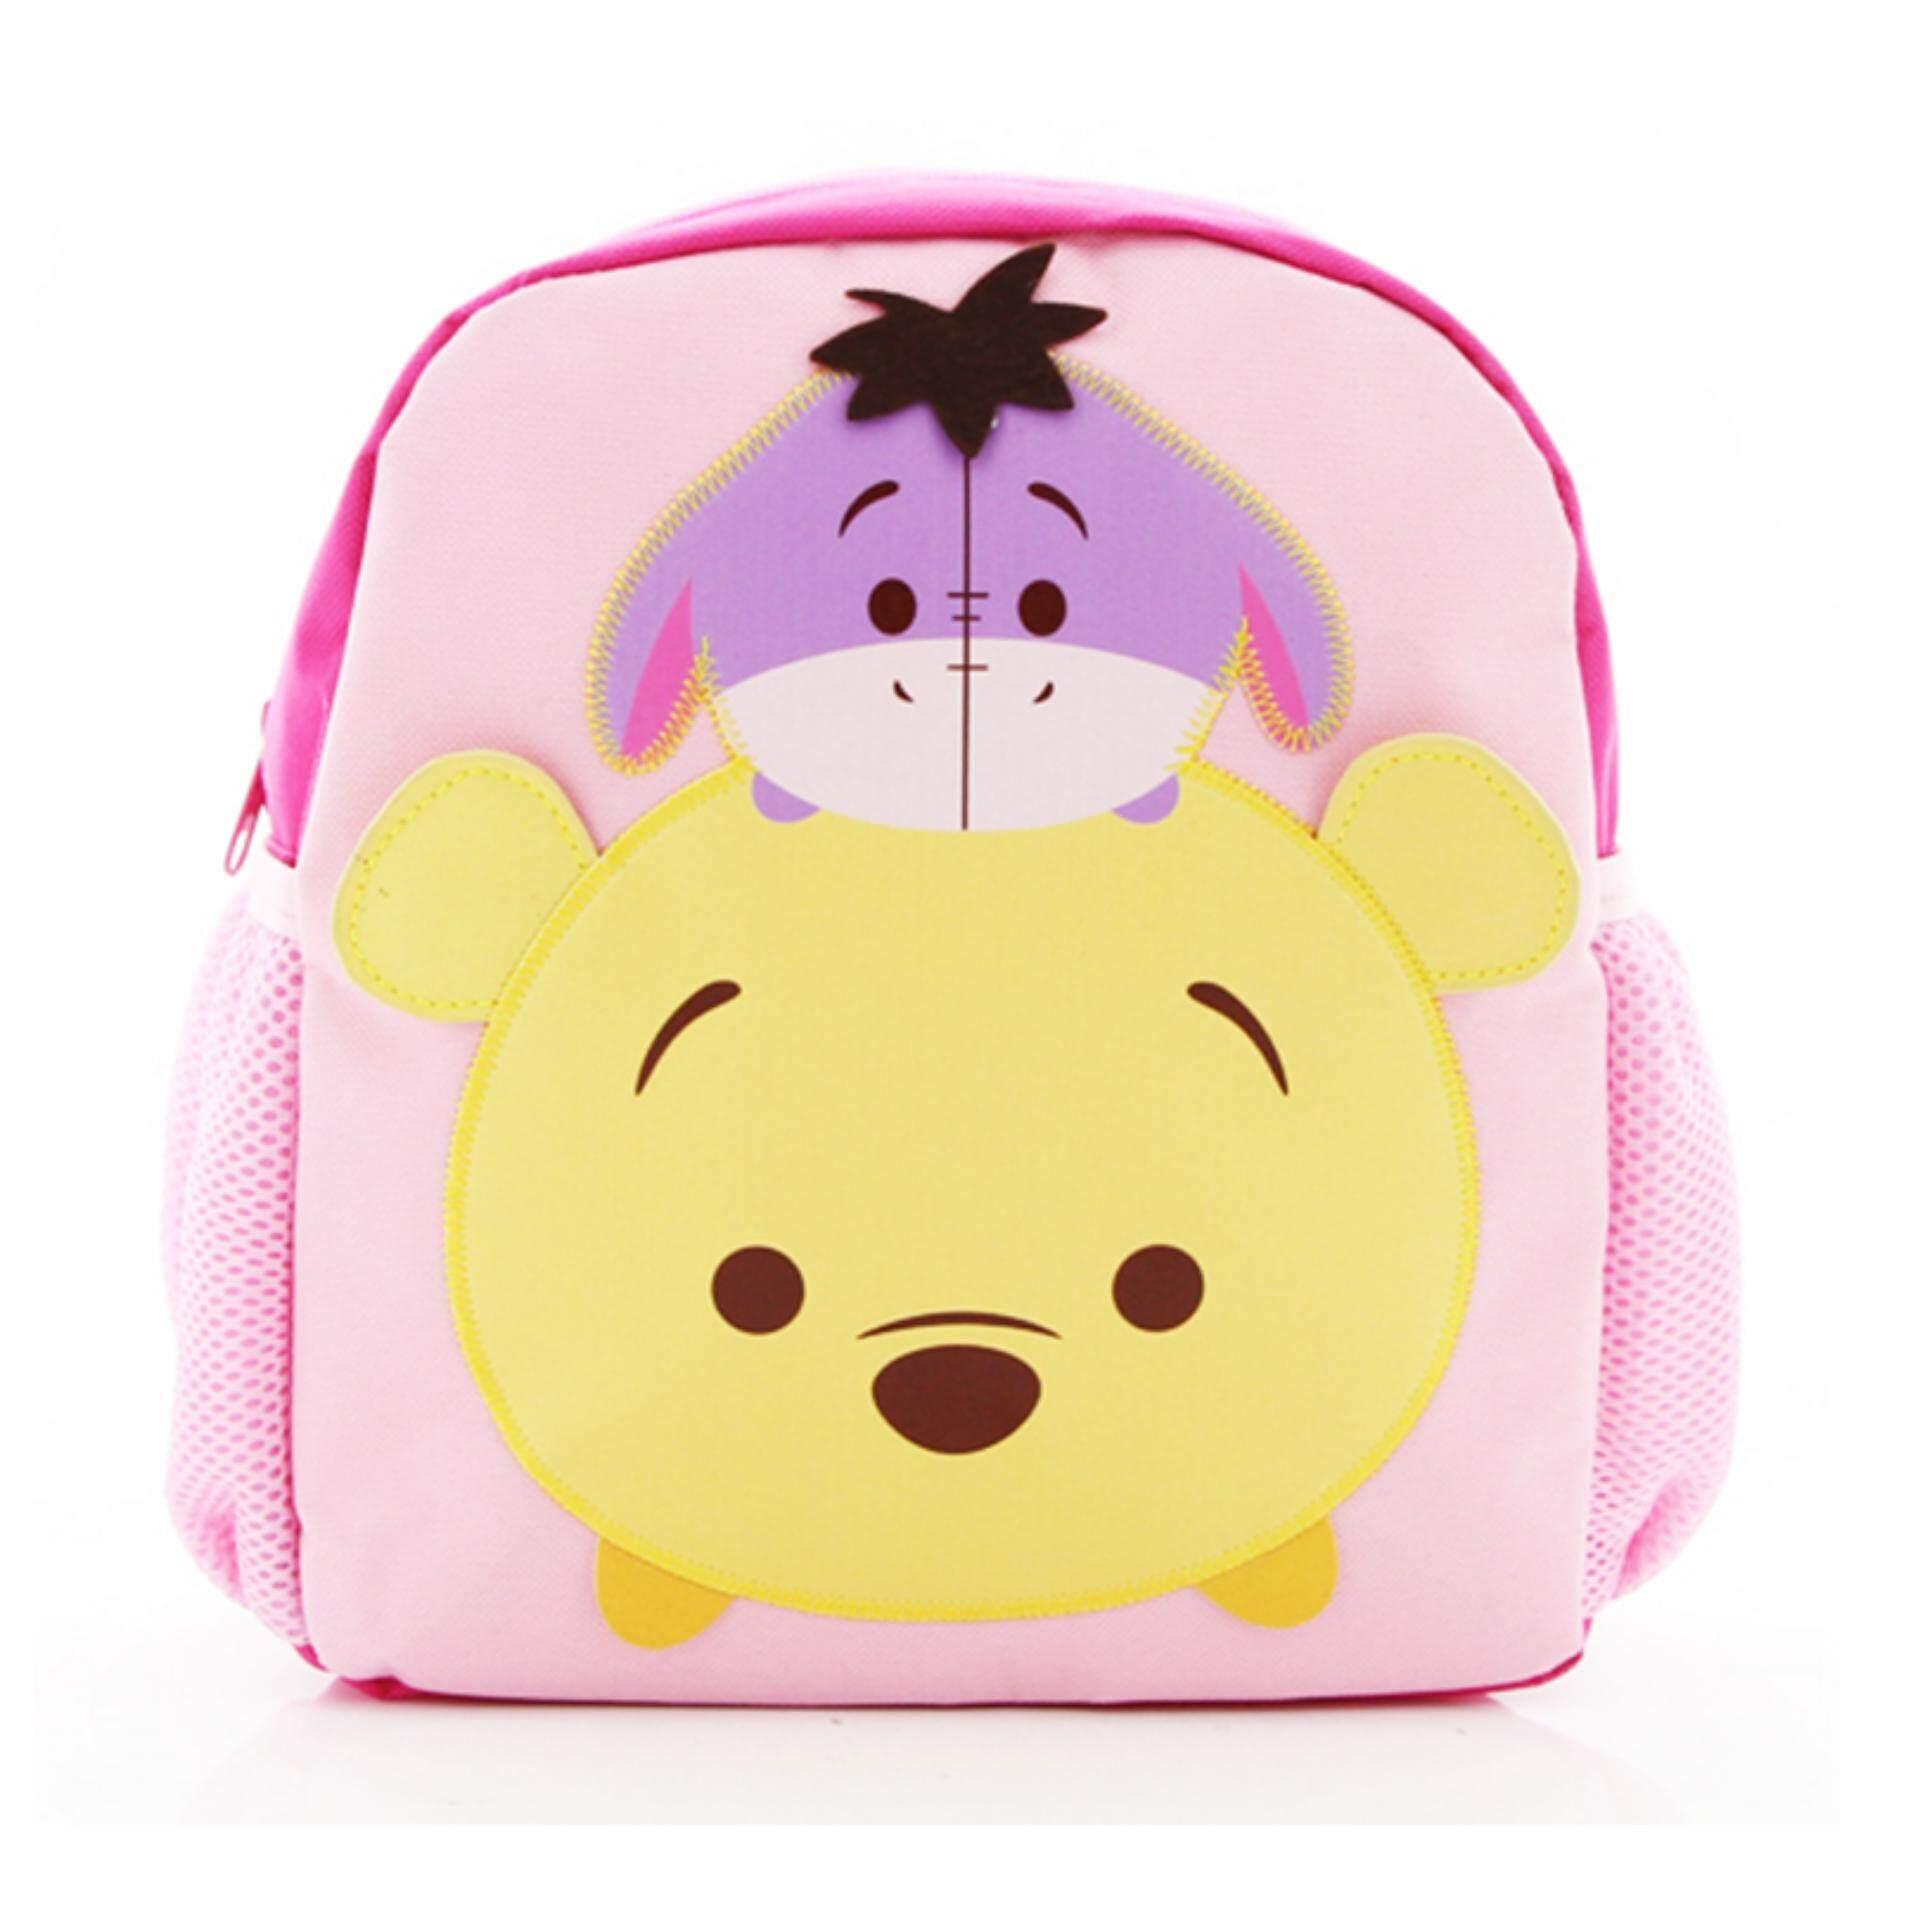 Disney Tsum Tsum Backpack School Bag 12 Inches - Pooh & Eeyore